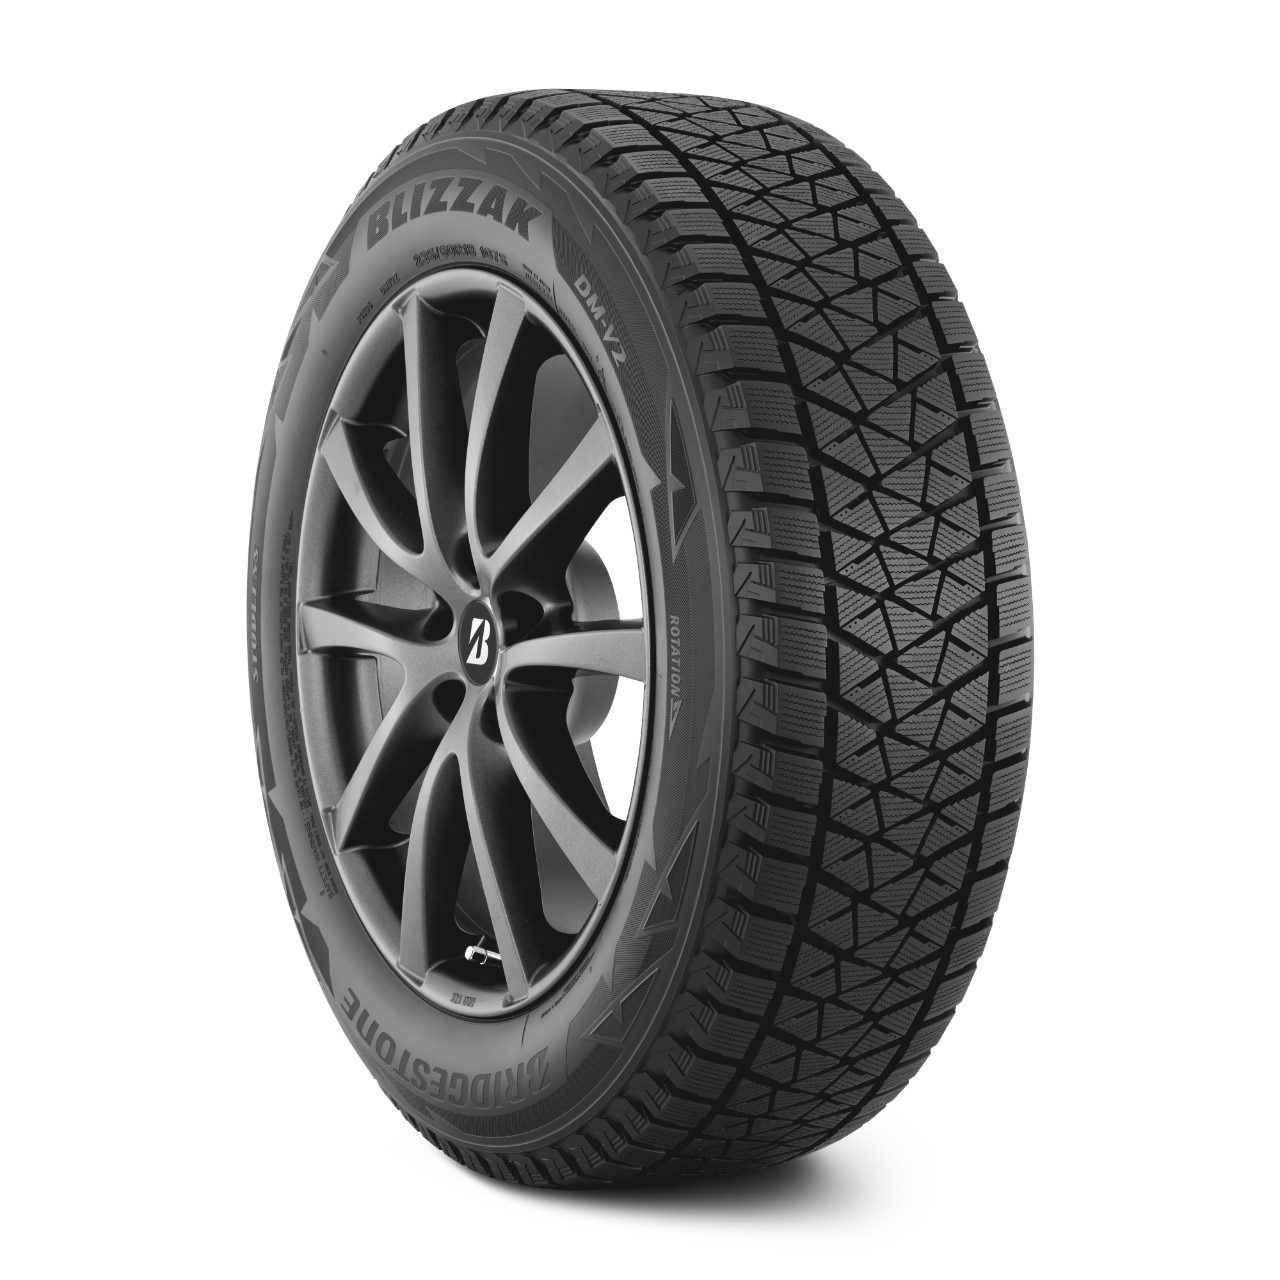 Bridgestone blizzak tire reviews - d2b7